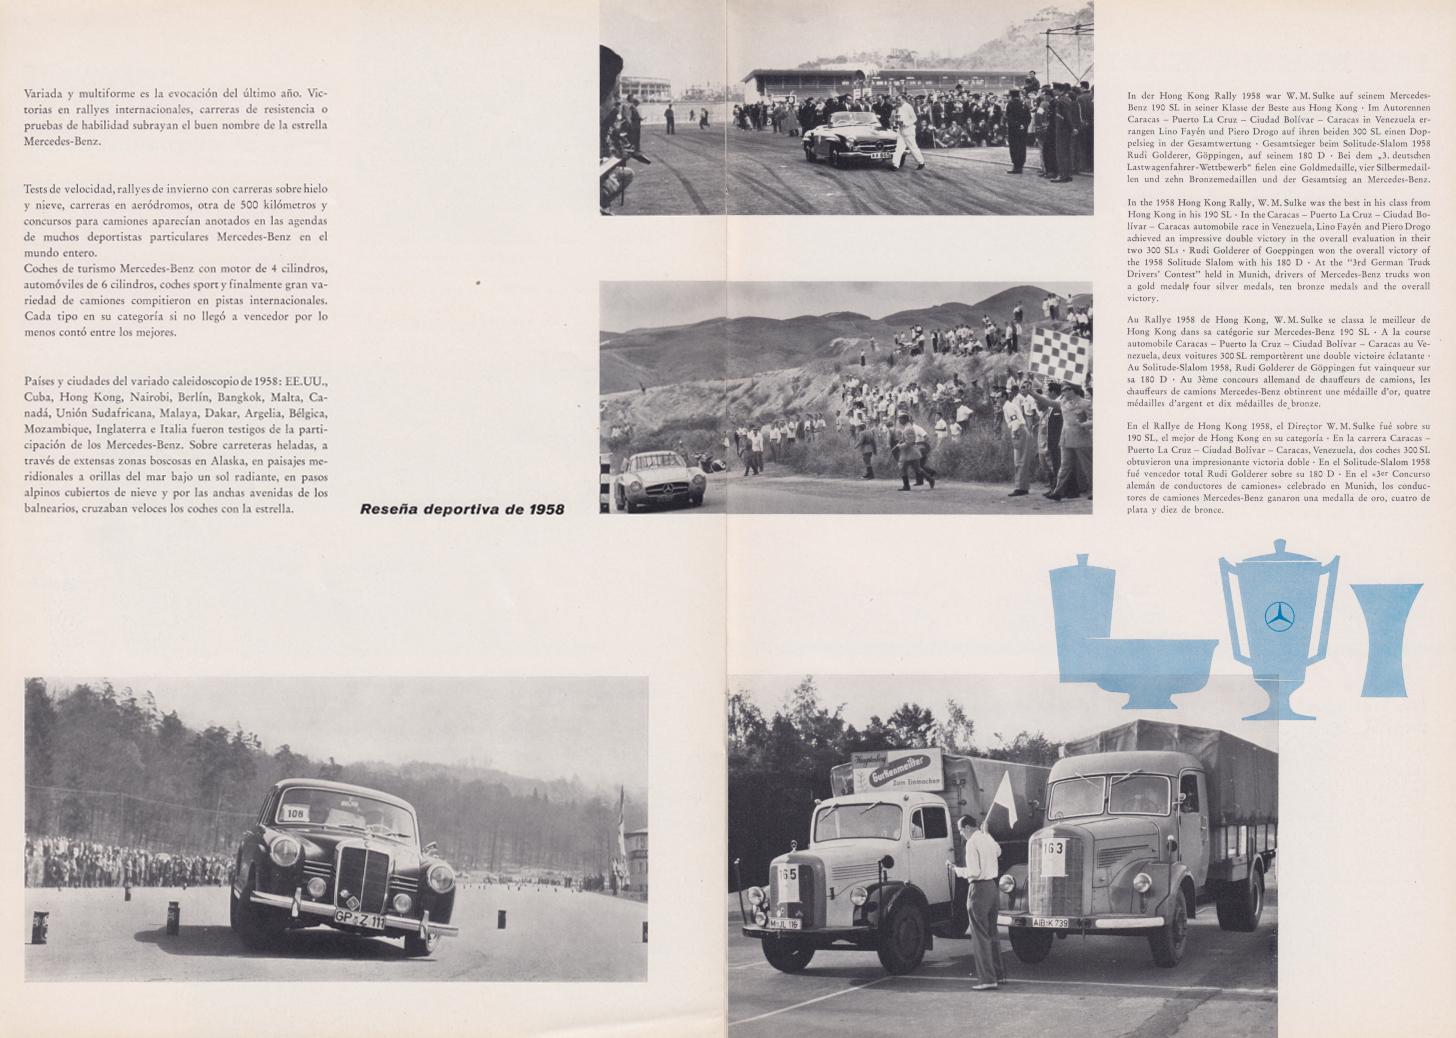 (REVISTA): Periódico In aller welt n.º 29 - Mercedes-Benz no mundo - 1959 - multilingue 009